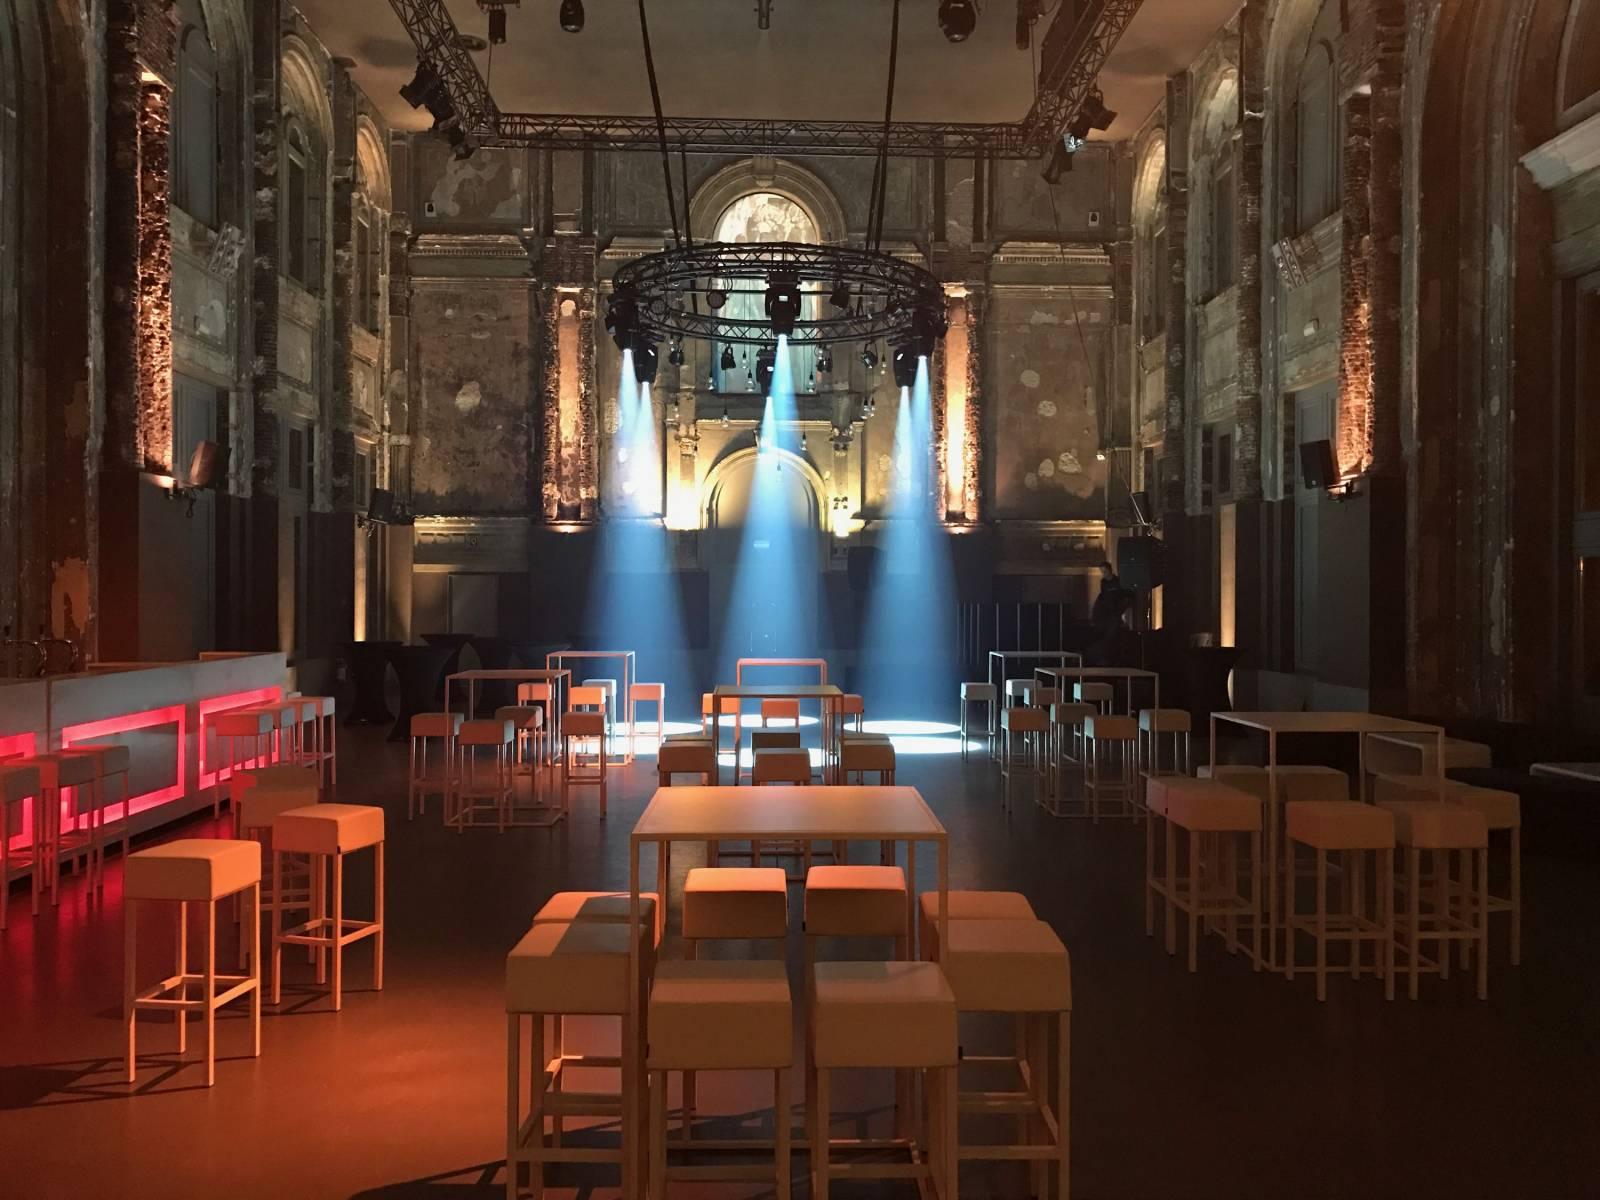 Zaal AthenA - Feestzaal - Trouwzaal - Antwerpen - House of Weddings - 19